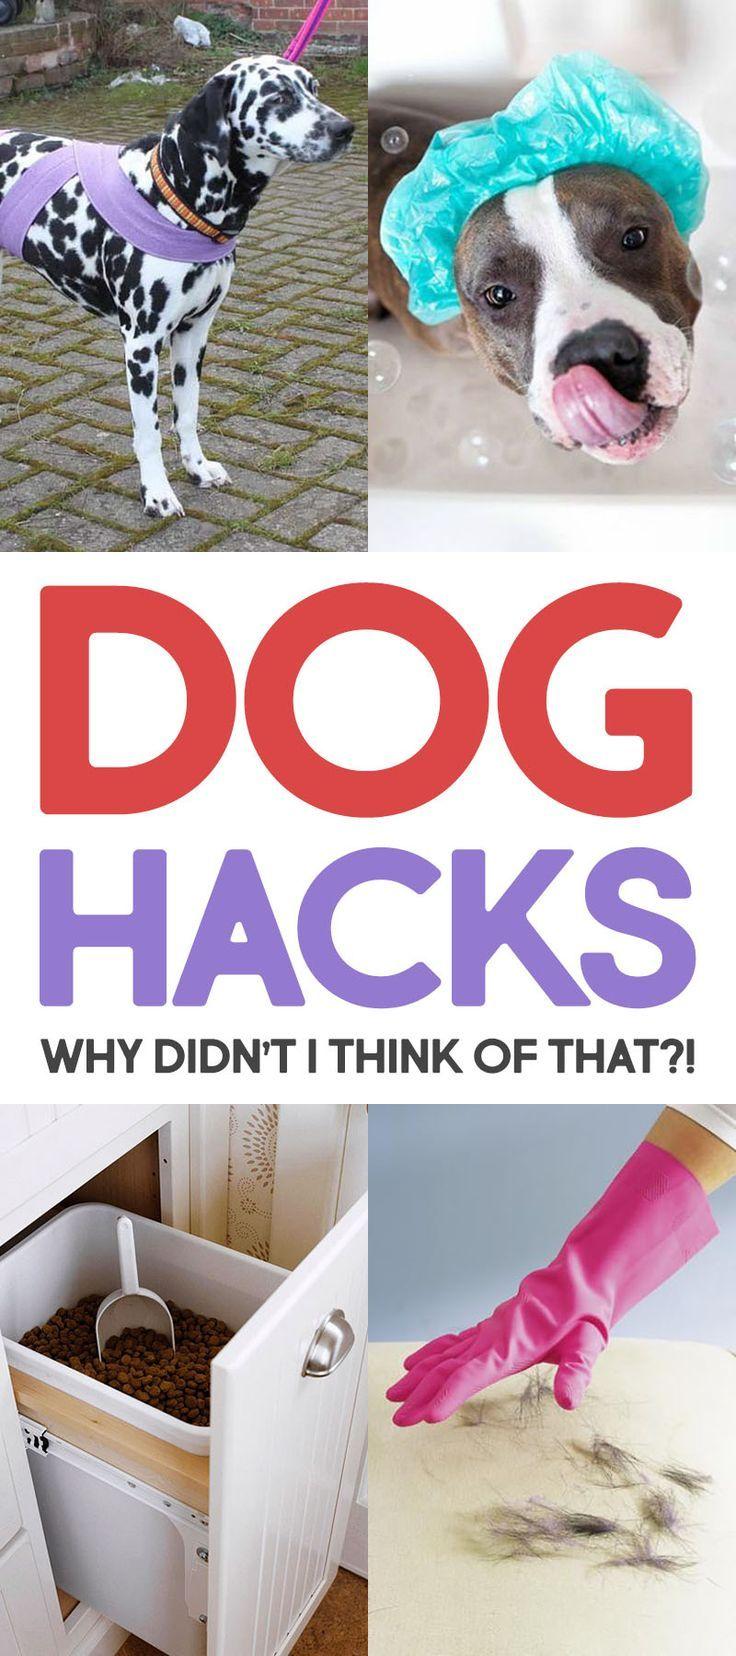 Dog Hacks Why Didn't I Think Of That Dog hacks, Dog